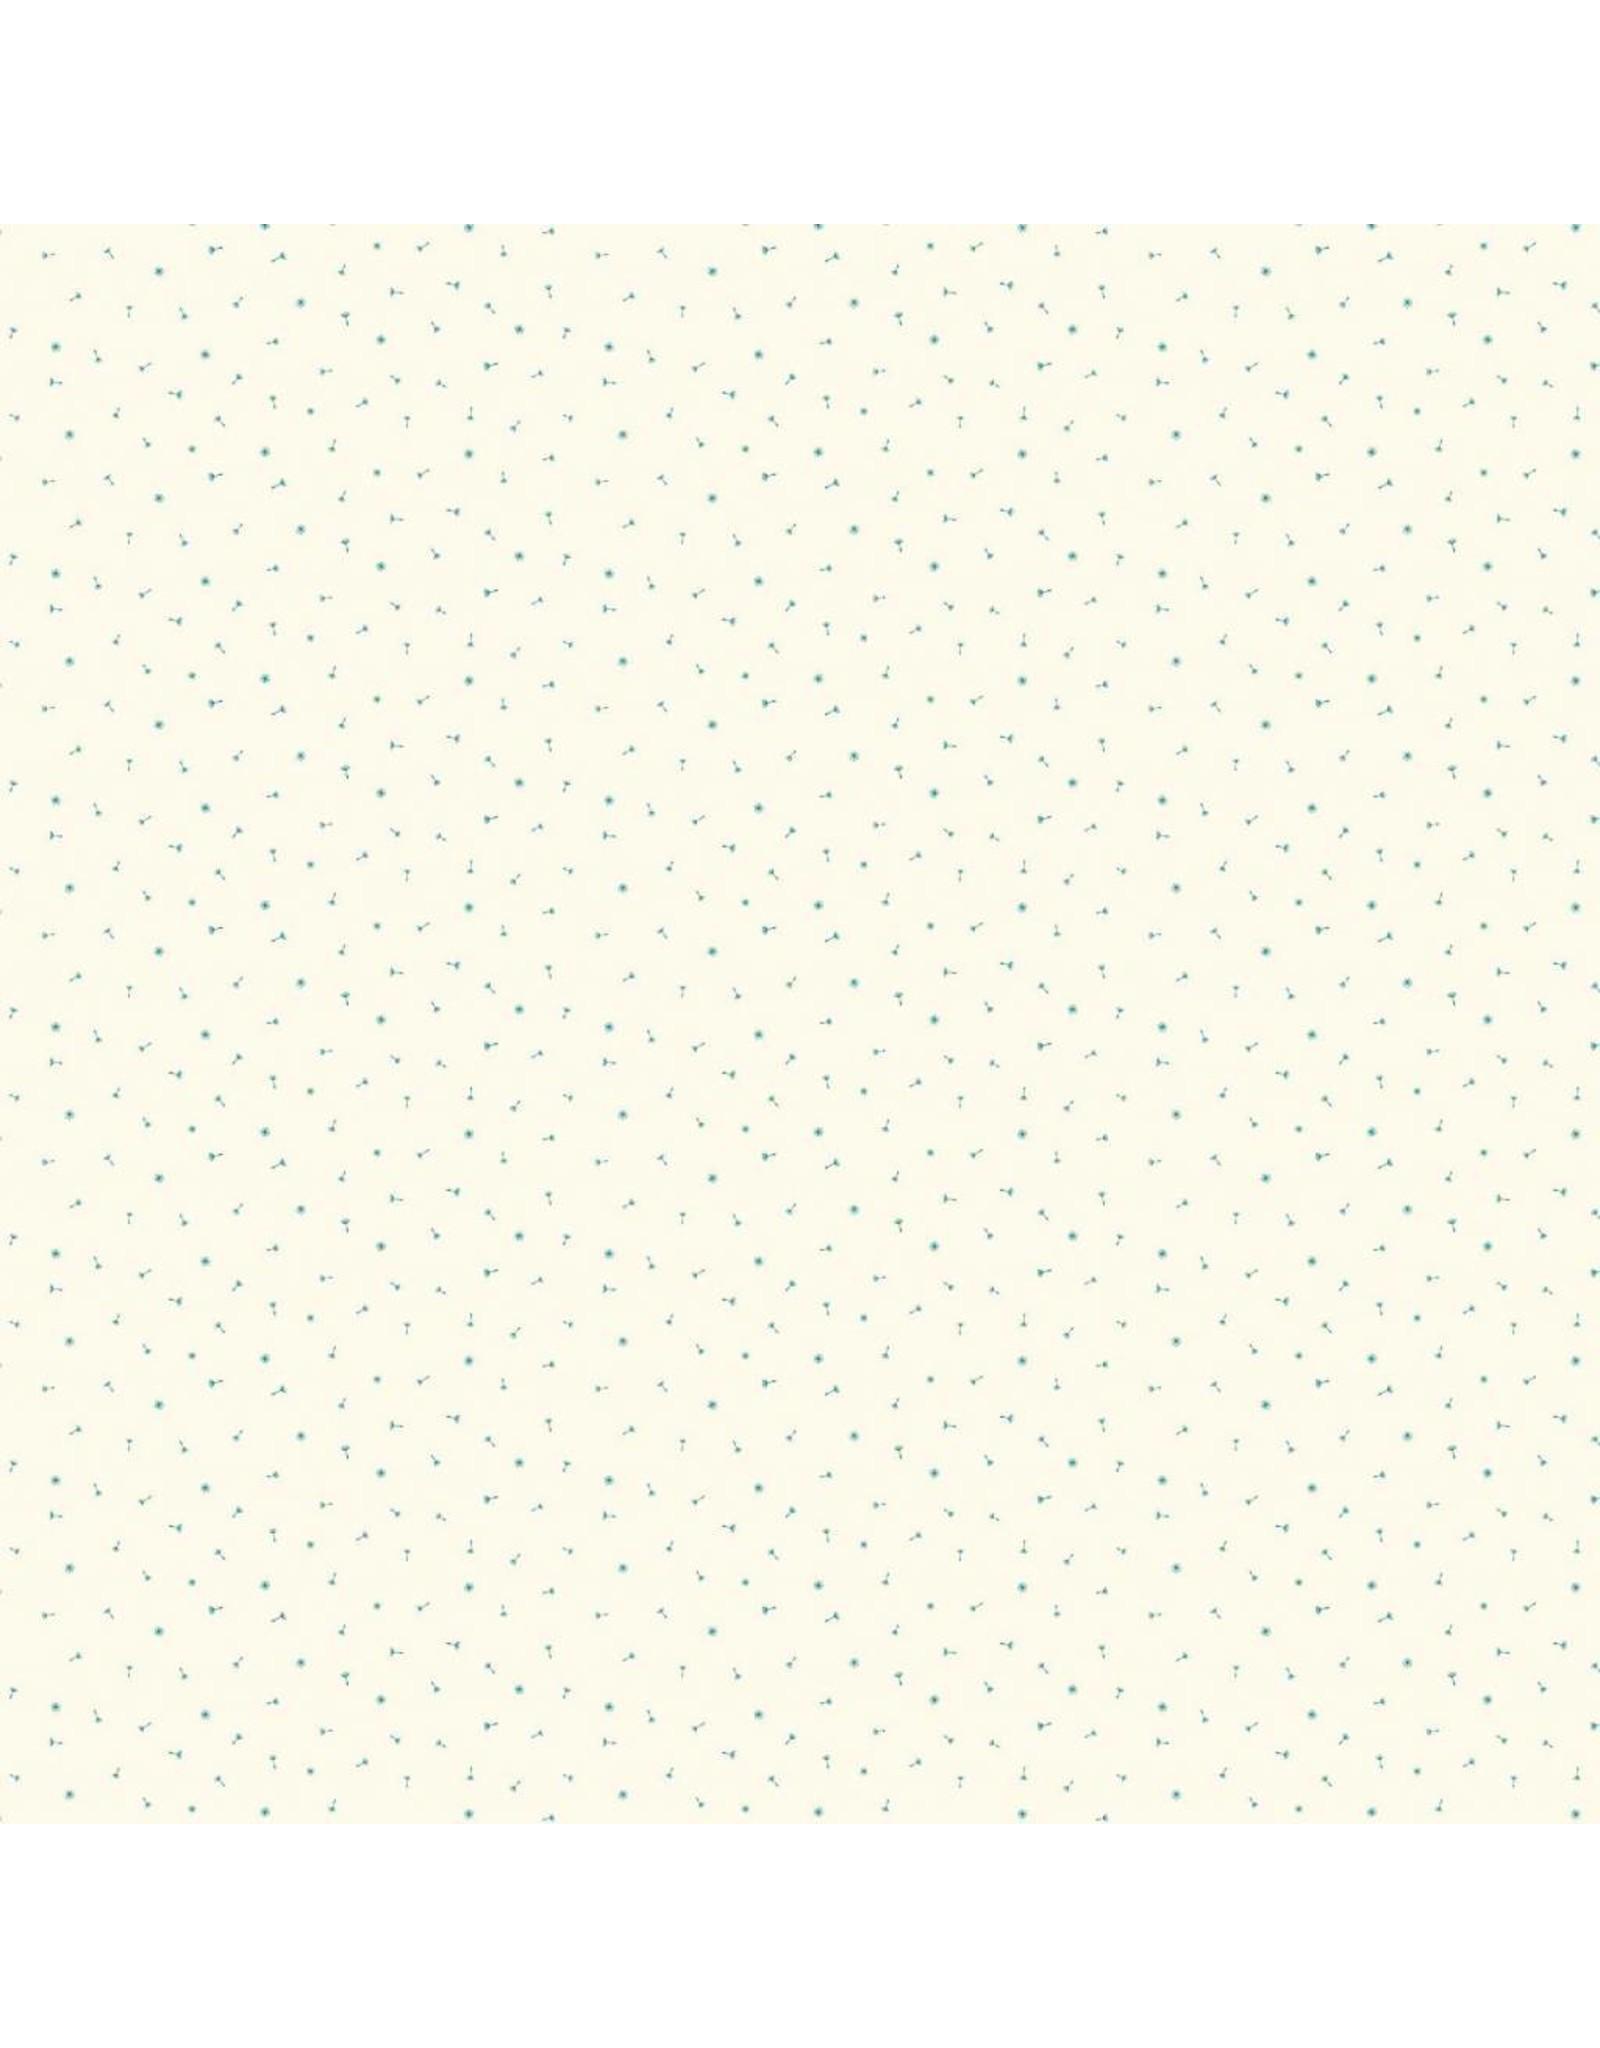 Figo Mountain Meadow - Dandelion Teal